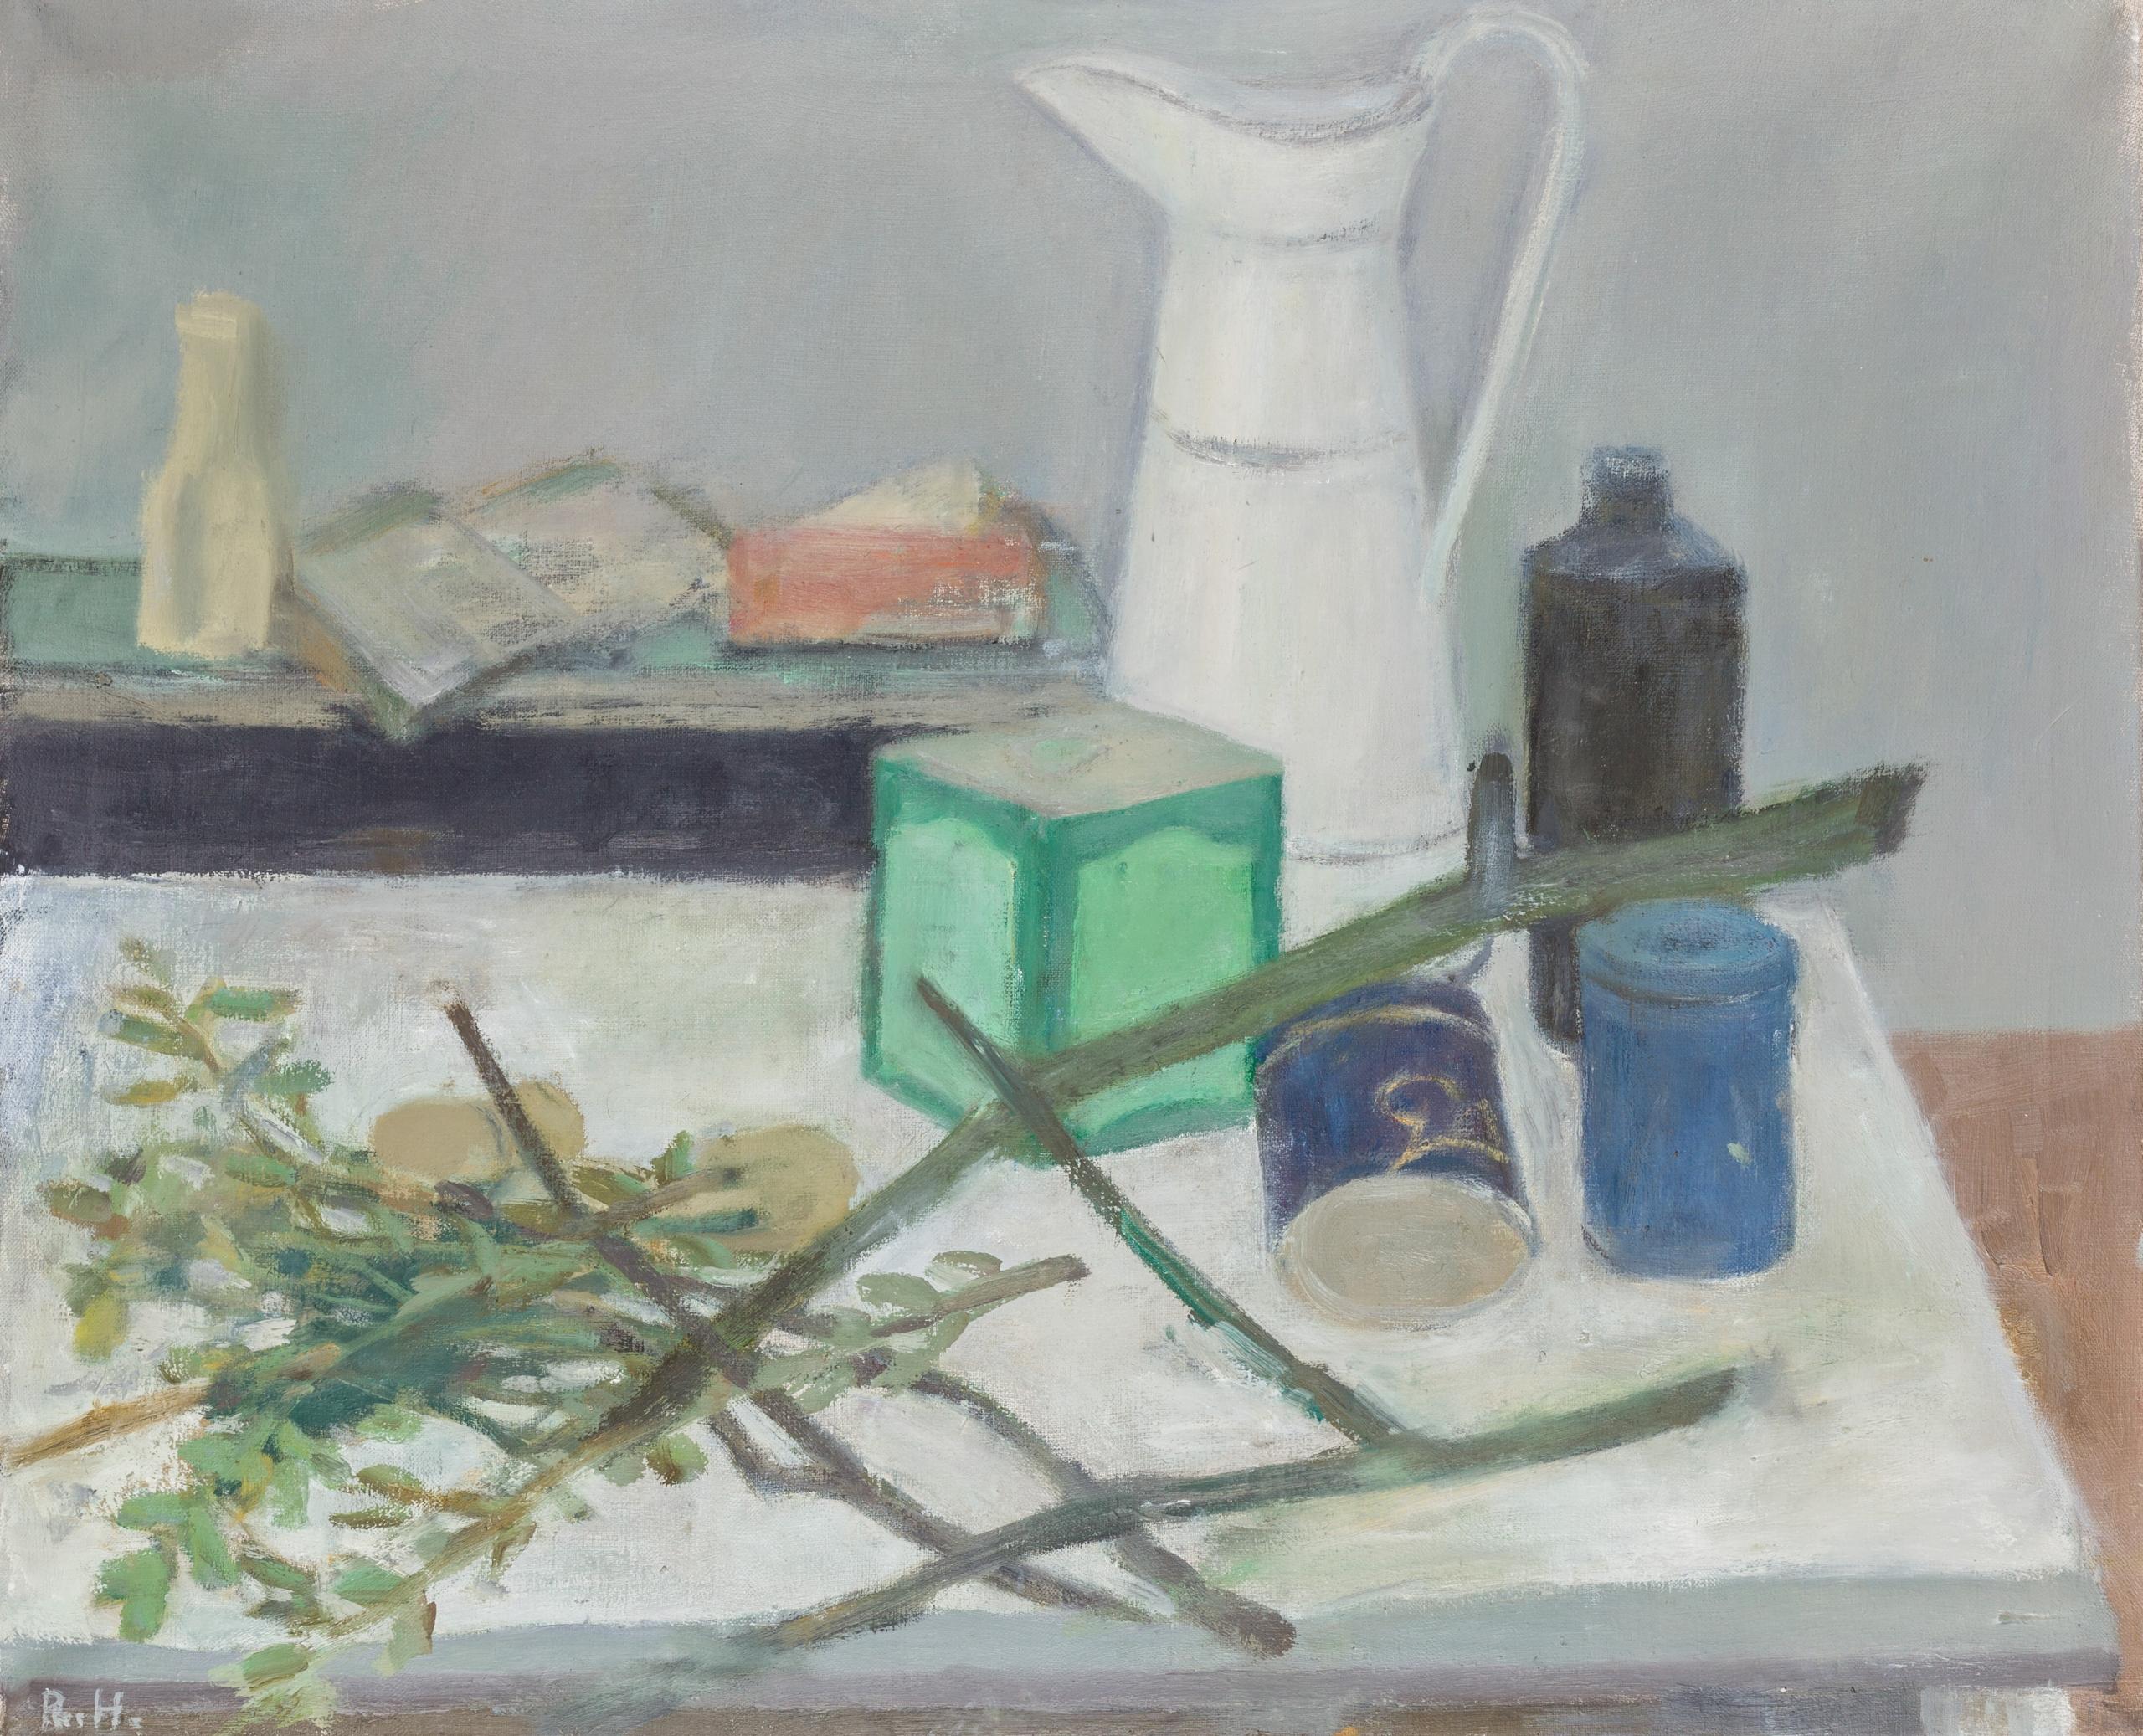 Rudolf Hradil, Stilleben mit Krug